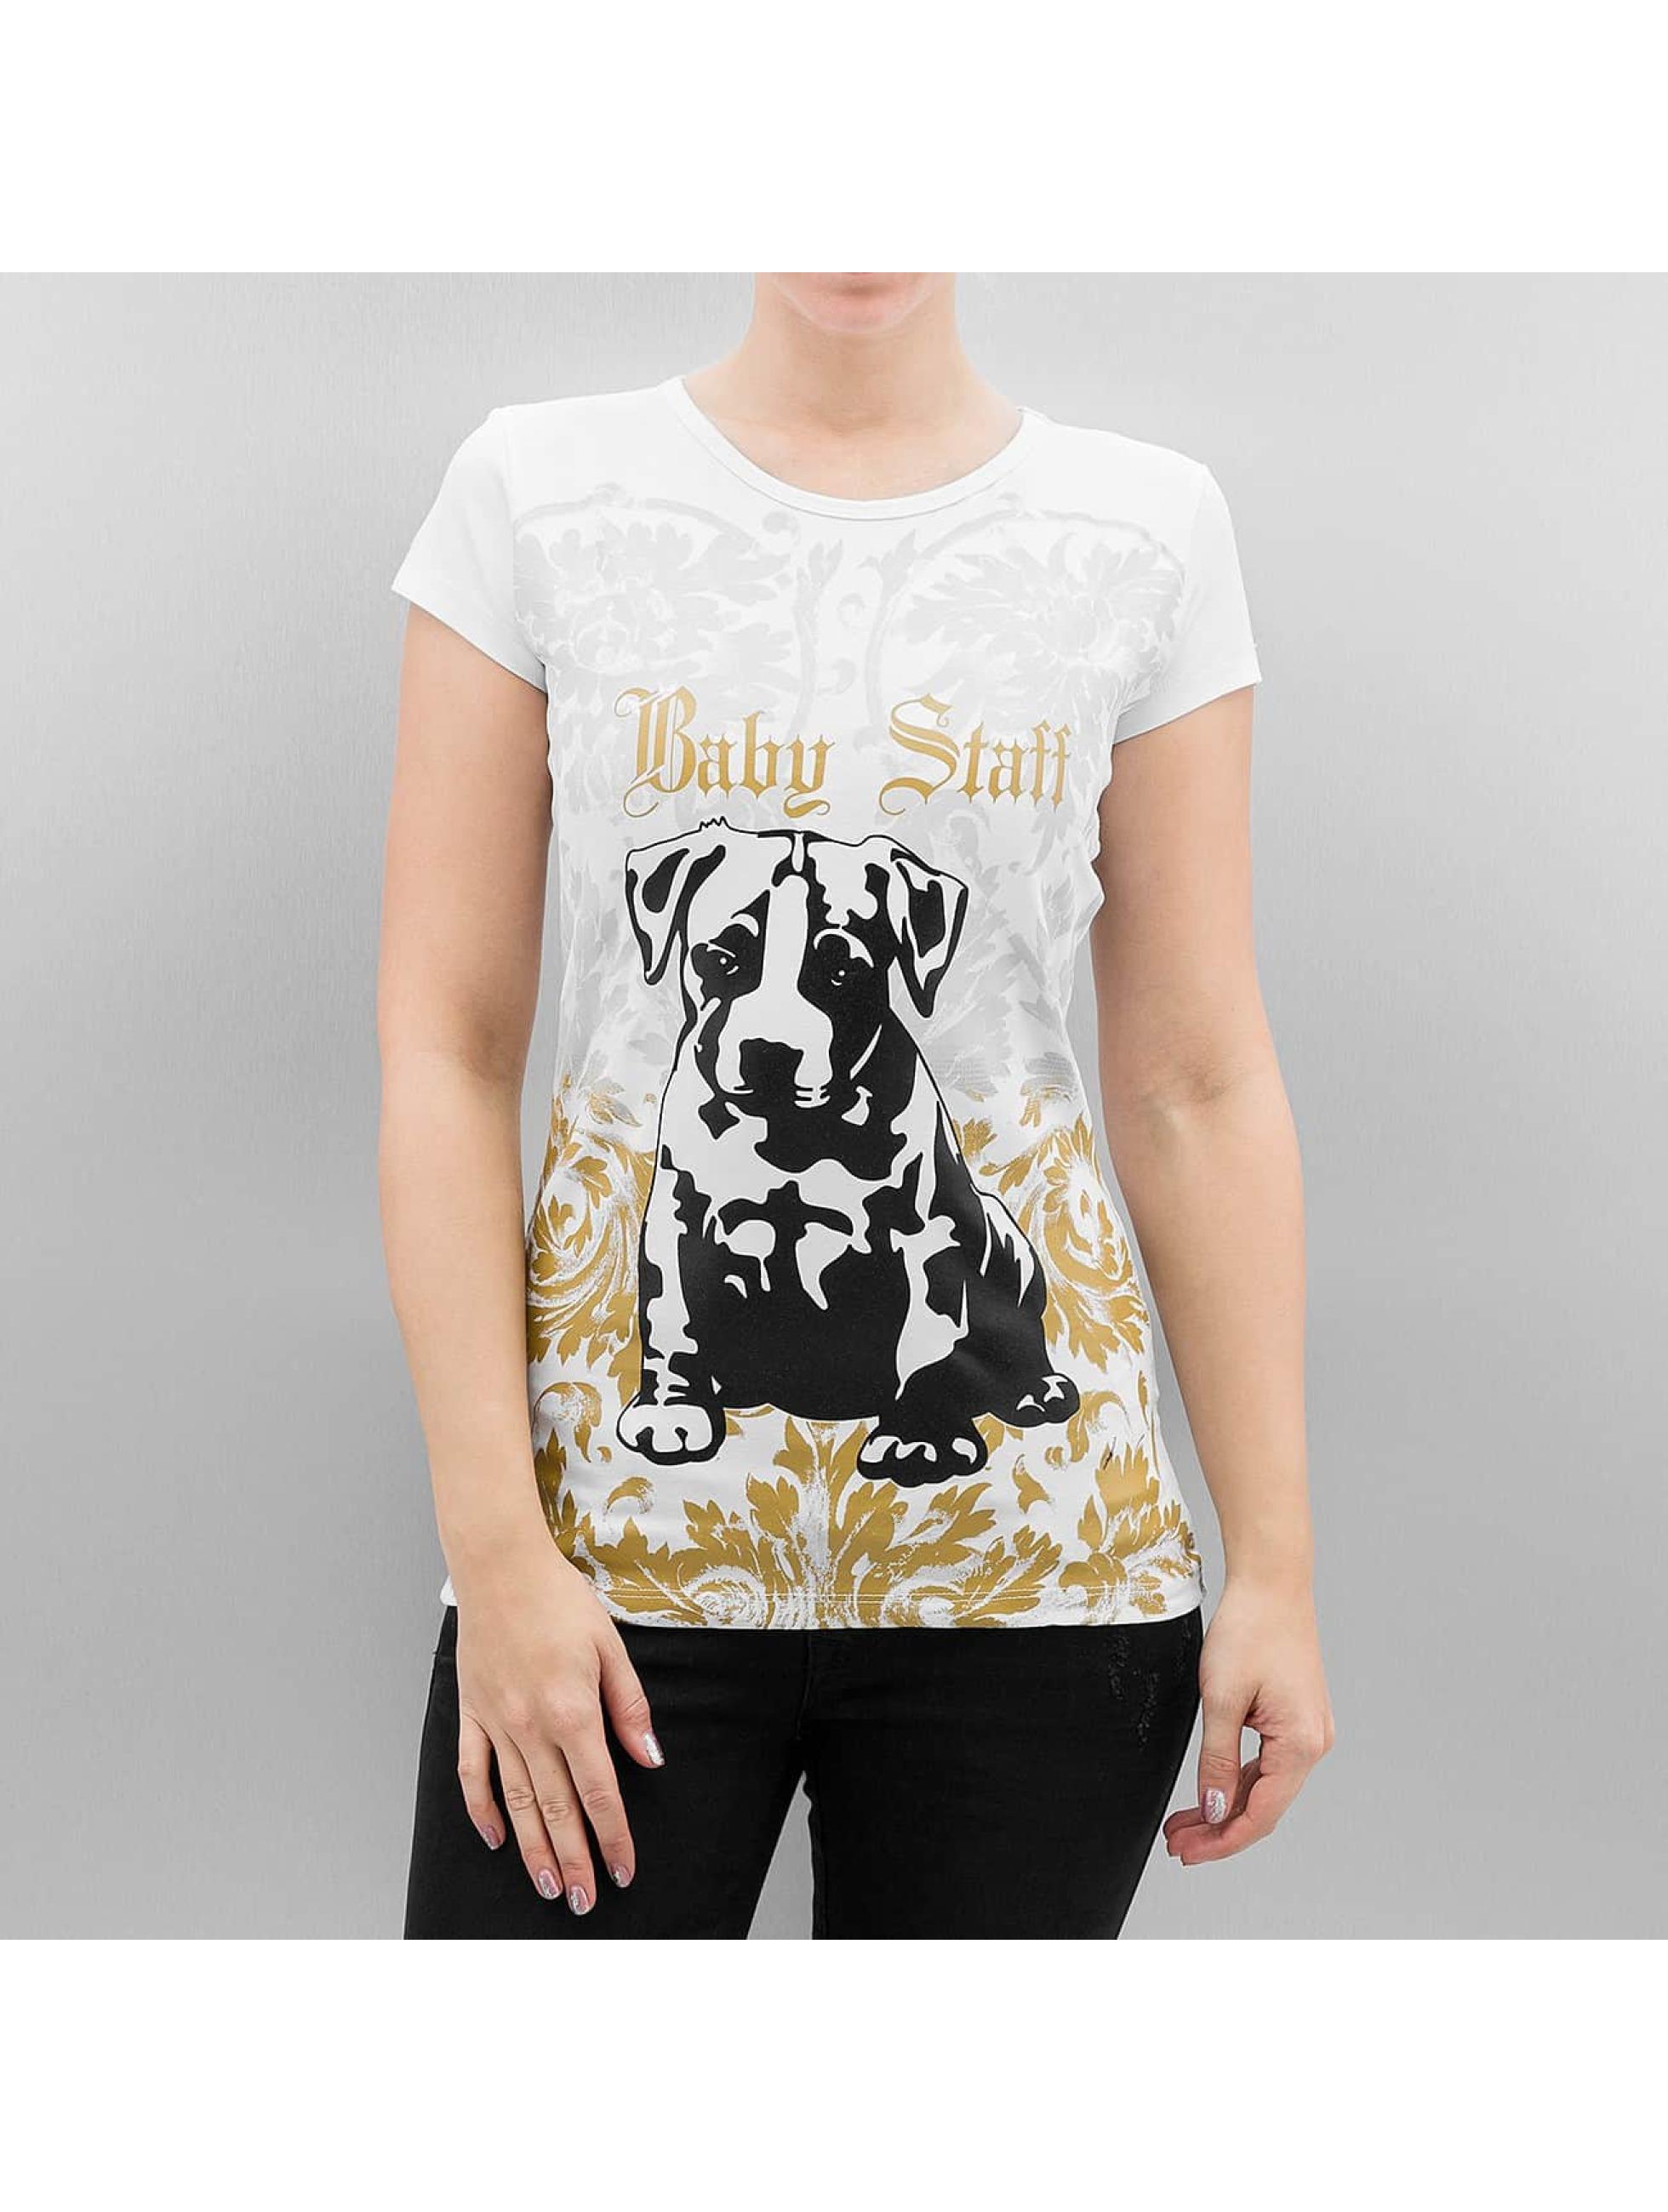 Babystaff T-Shirt Geza white